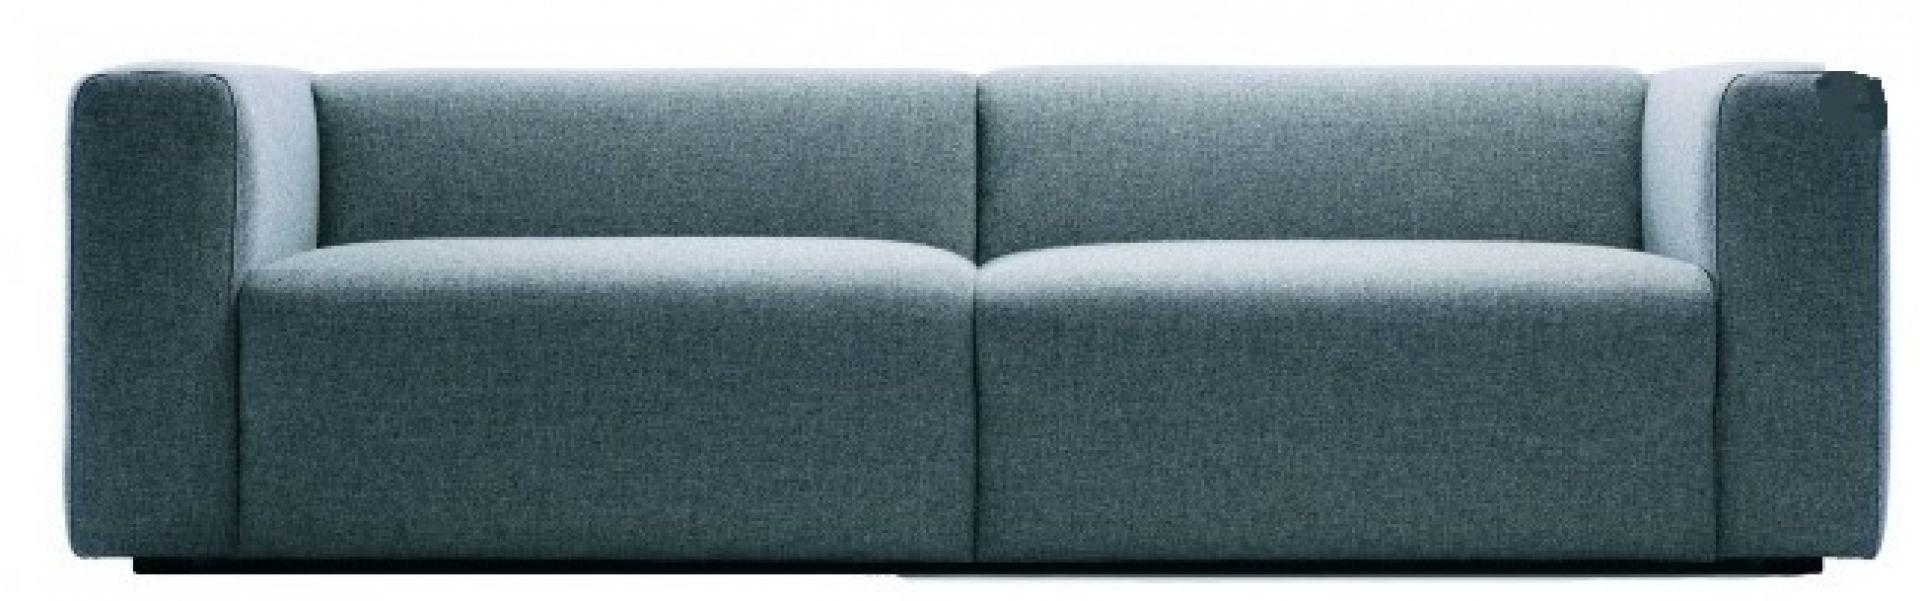 Mags Soft 2 1/2-Sitzer Sofa Hay